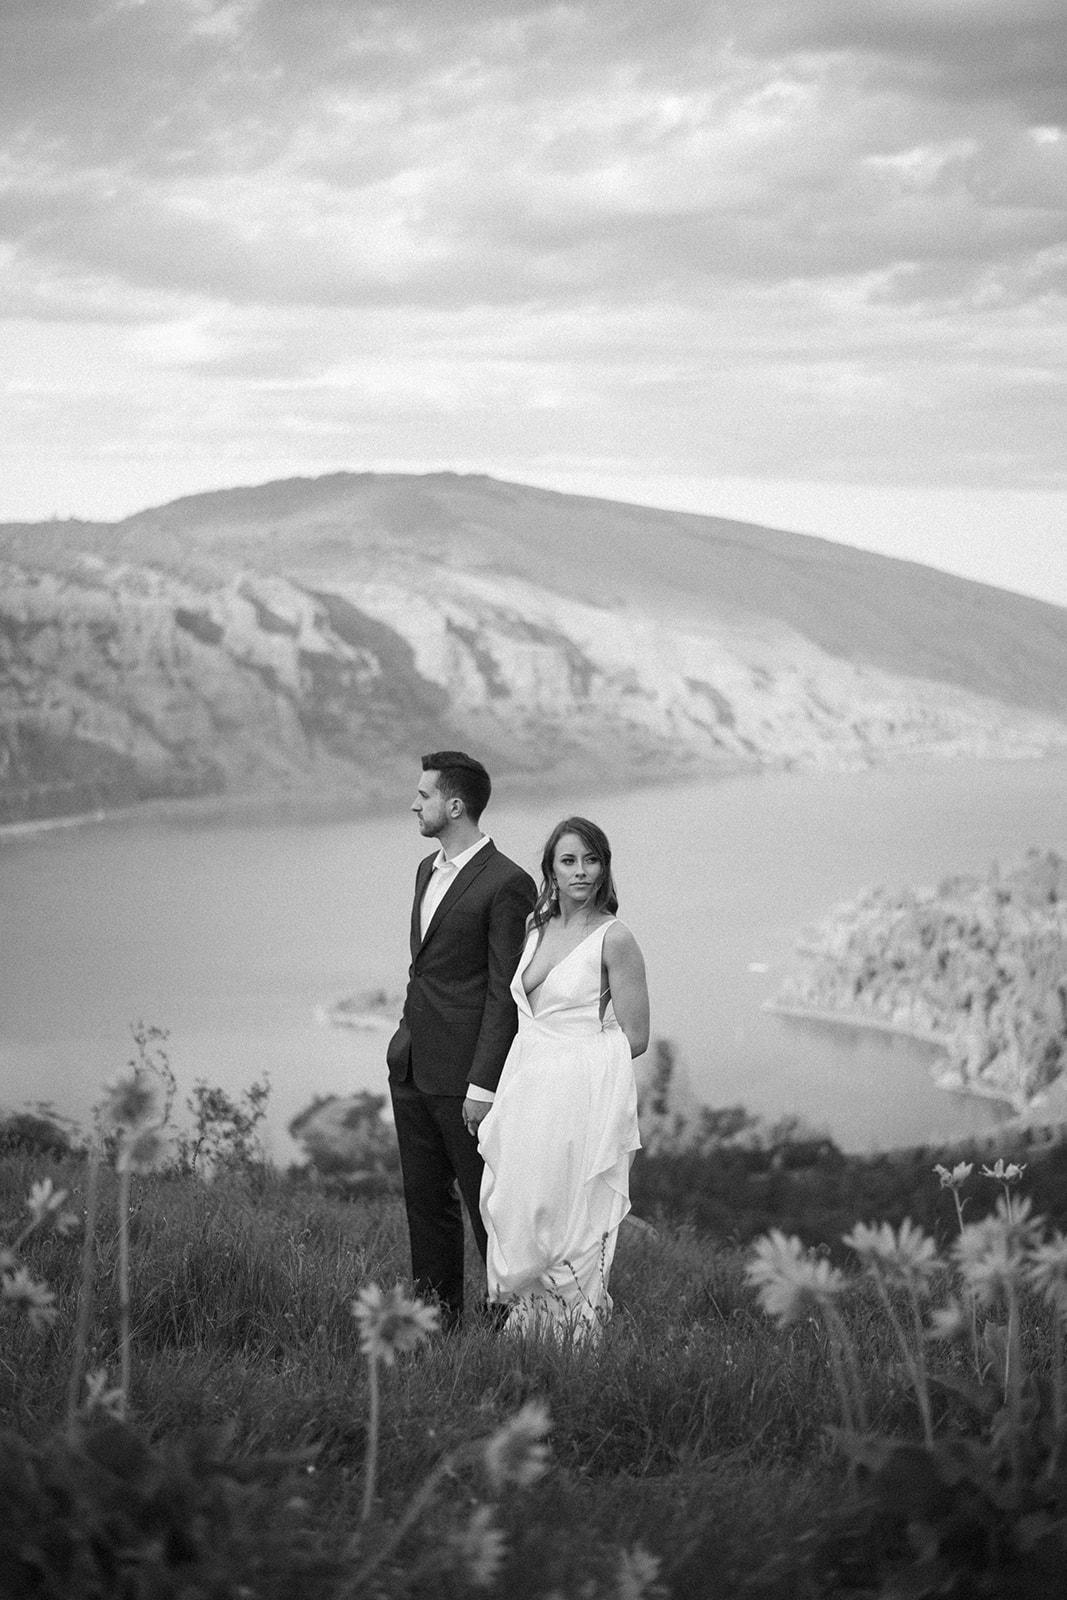 kamea_events_wedding_planner_portland_DeusAmor66.jpg